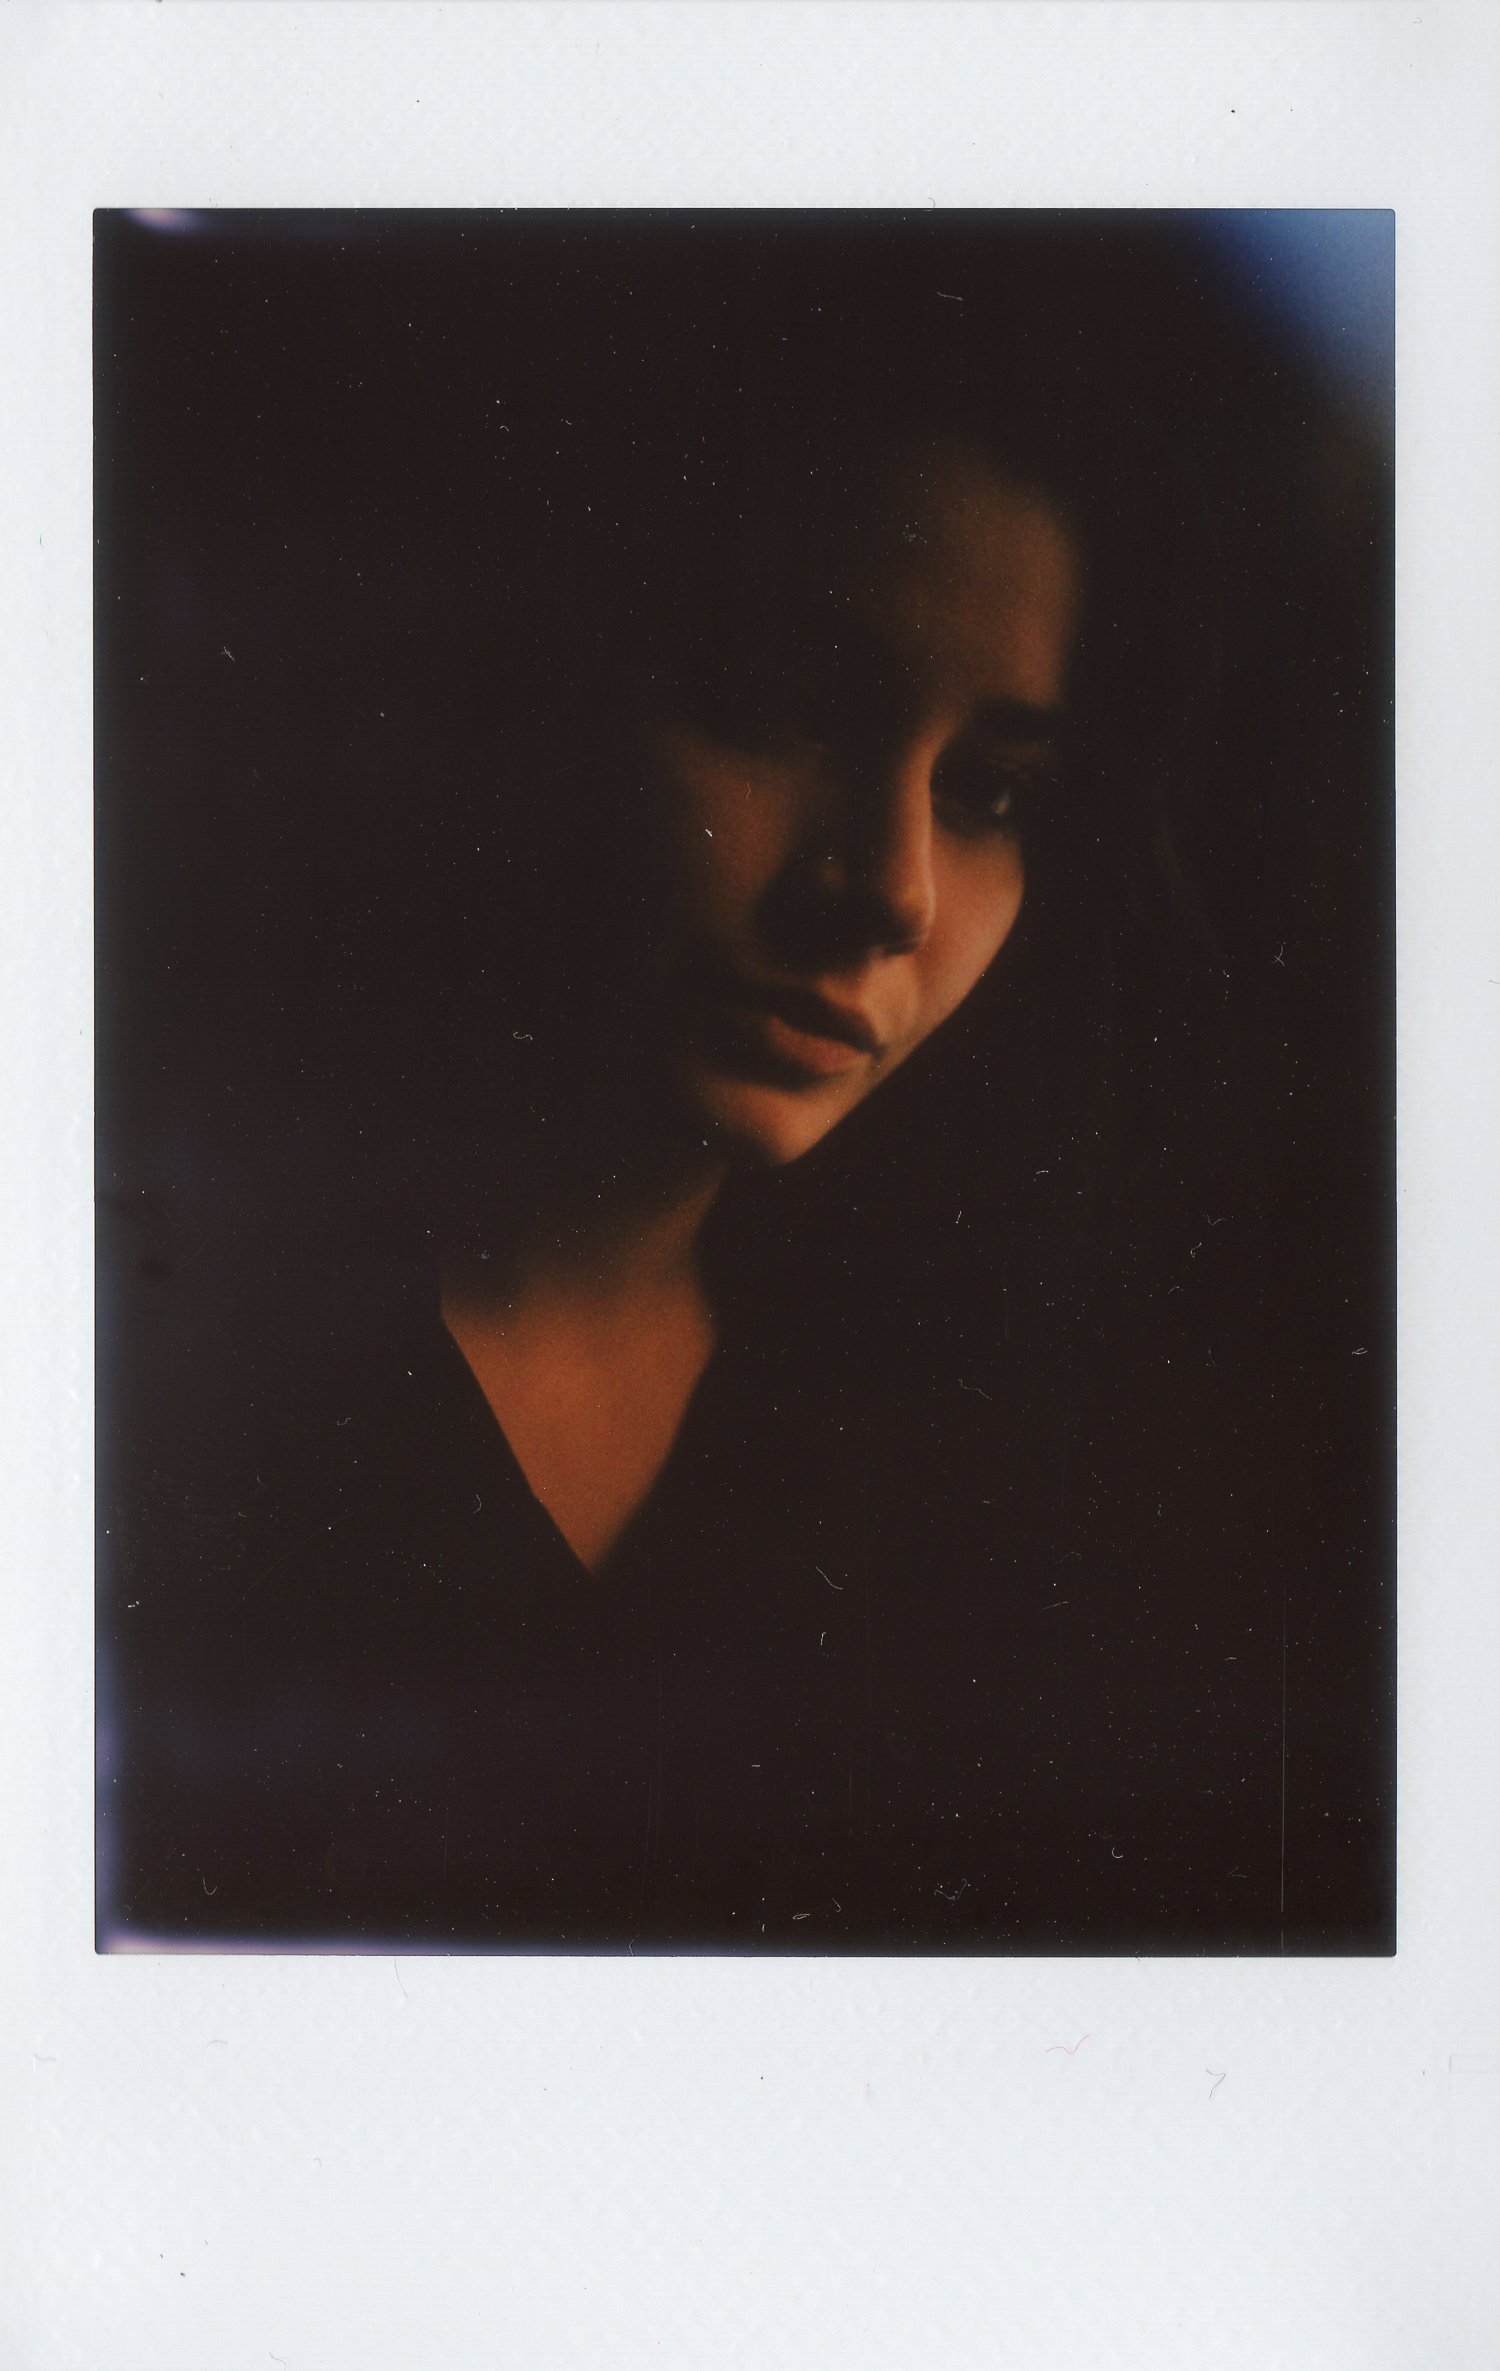 INSTAX195_Mint_camera_TL70_Cécile_Acevedo-_Romain_Sandt